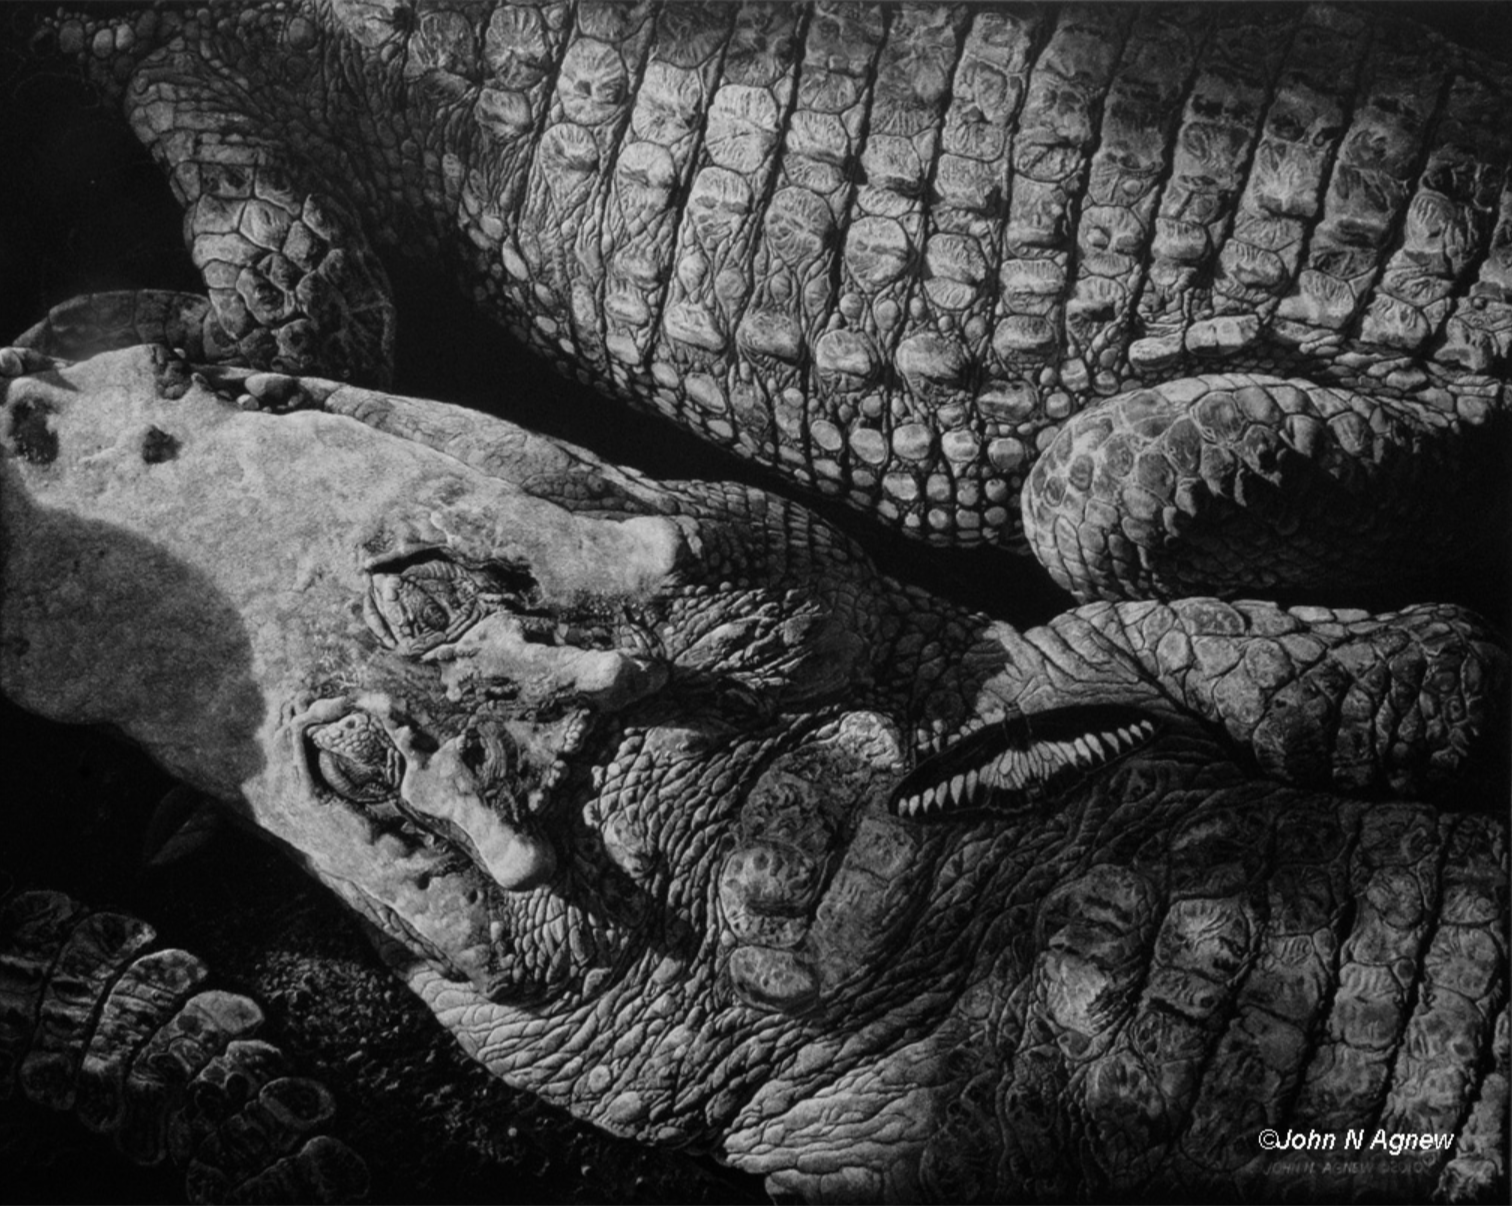 JOHN H. AGNEW, CROCODILE DREAMS  SCRATCHBOARD, 11 IN. X 14 IN.